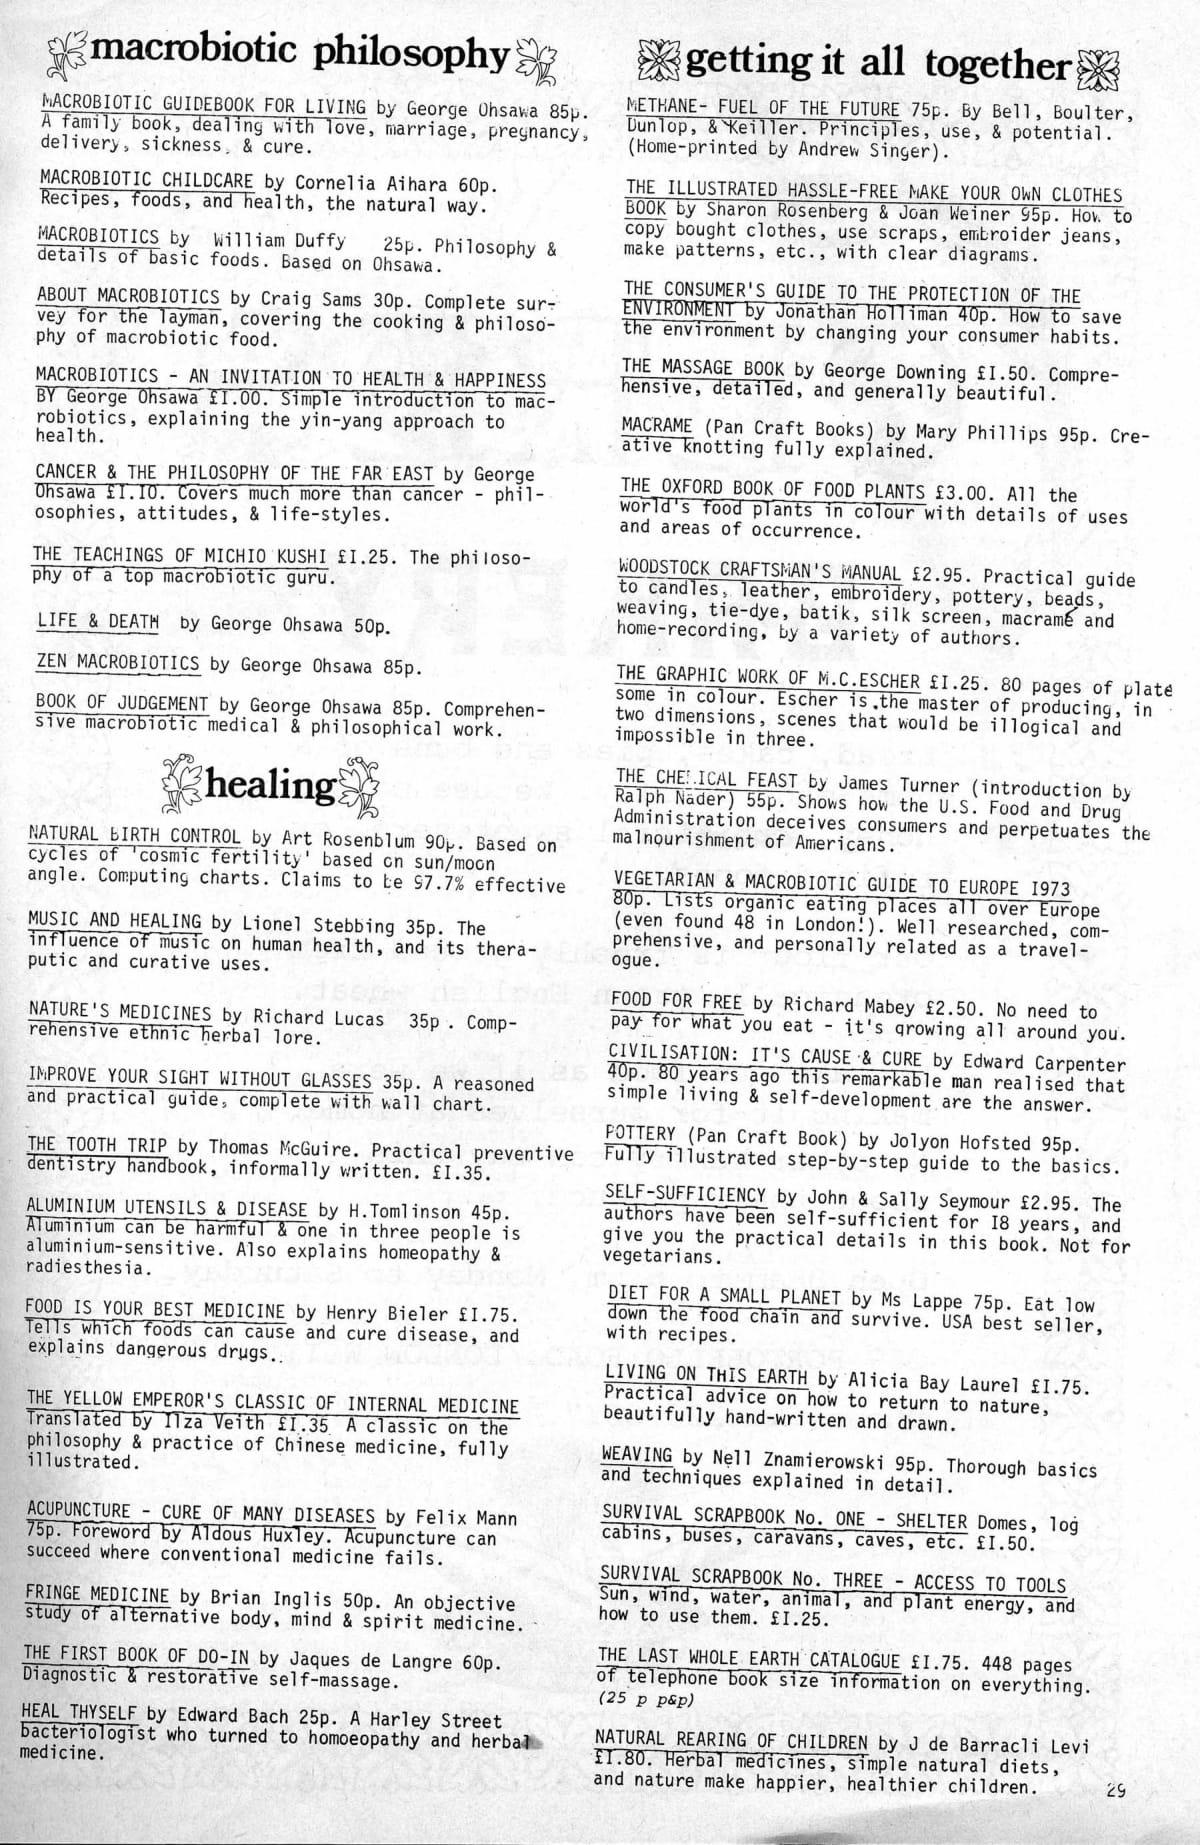 seed-v3-n1-jan1974-29.jpg